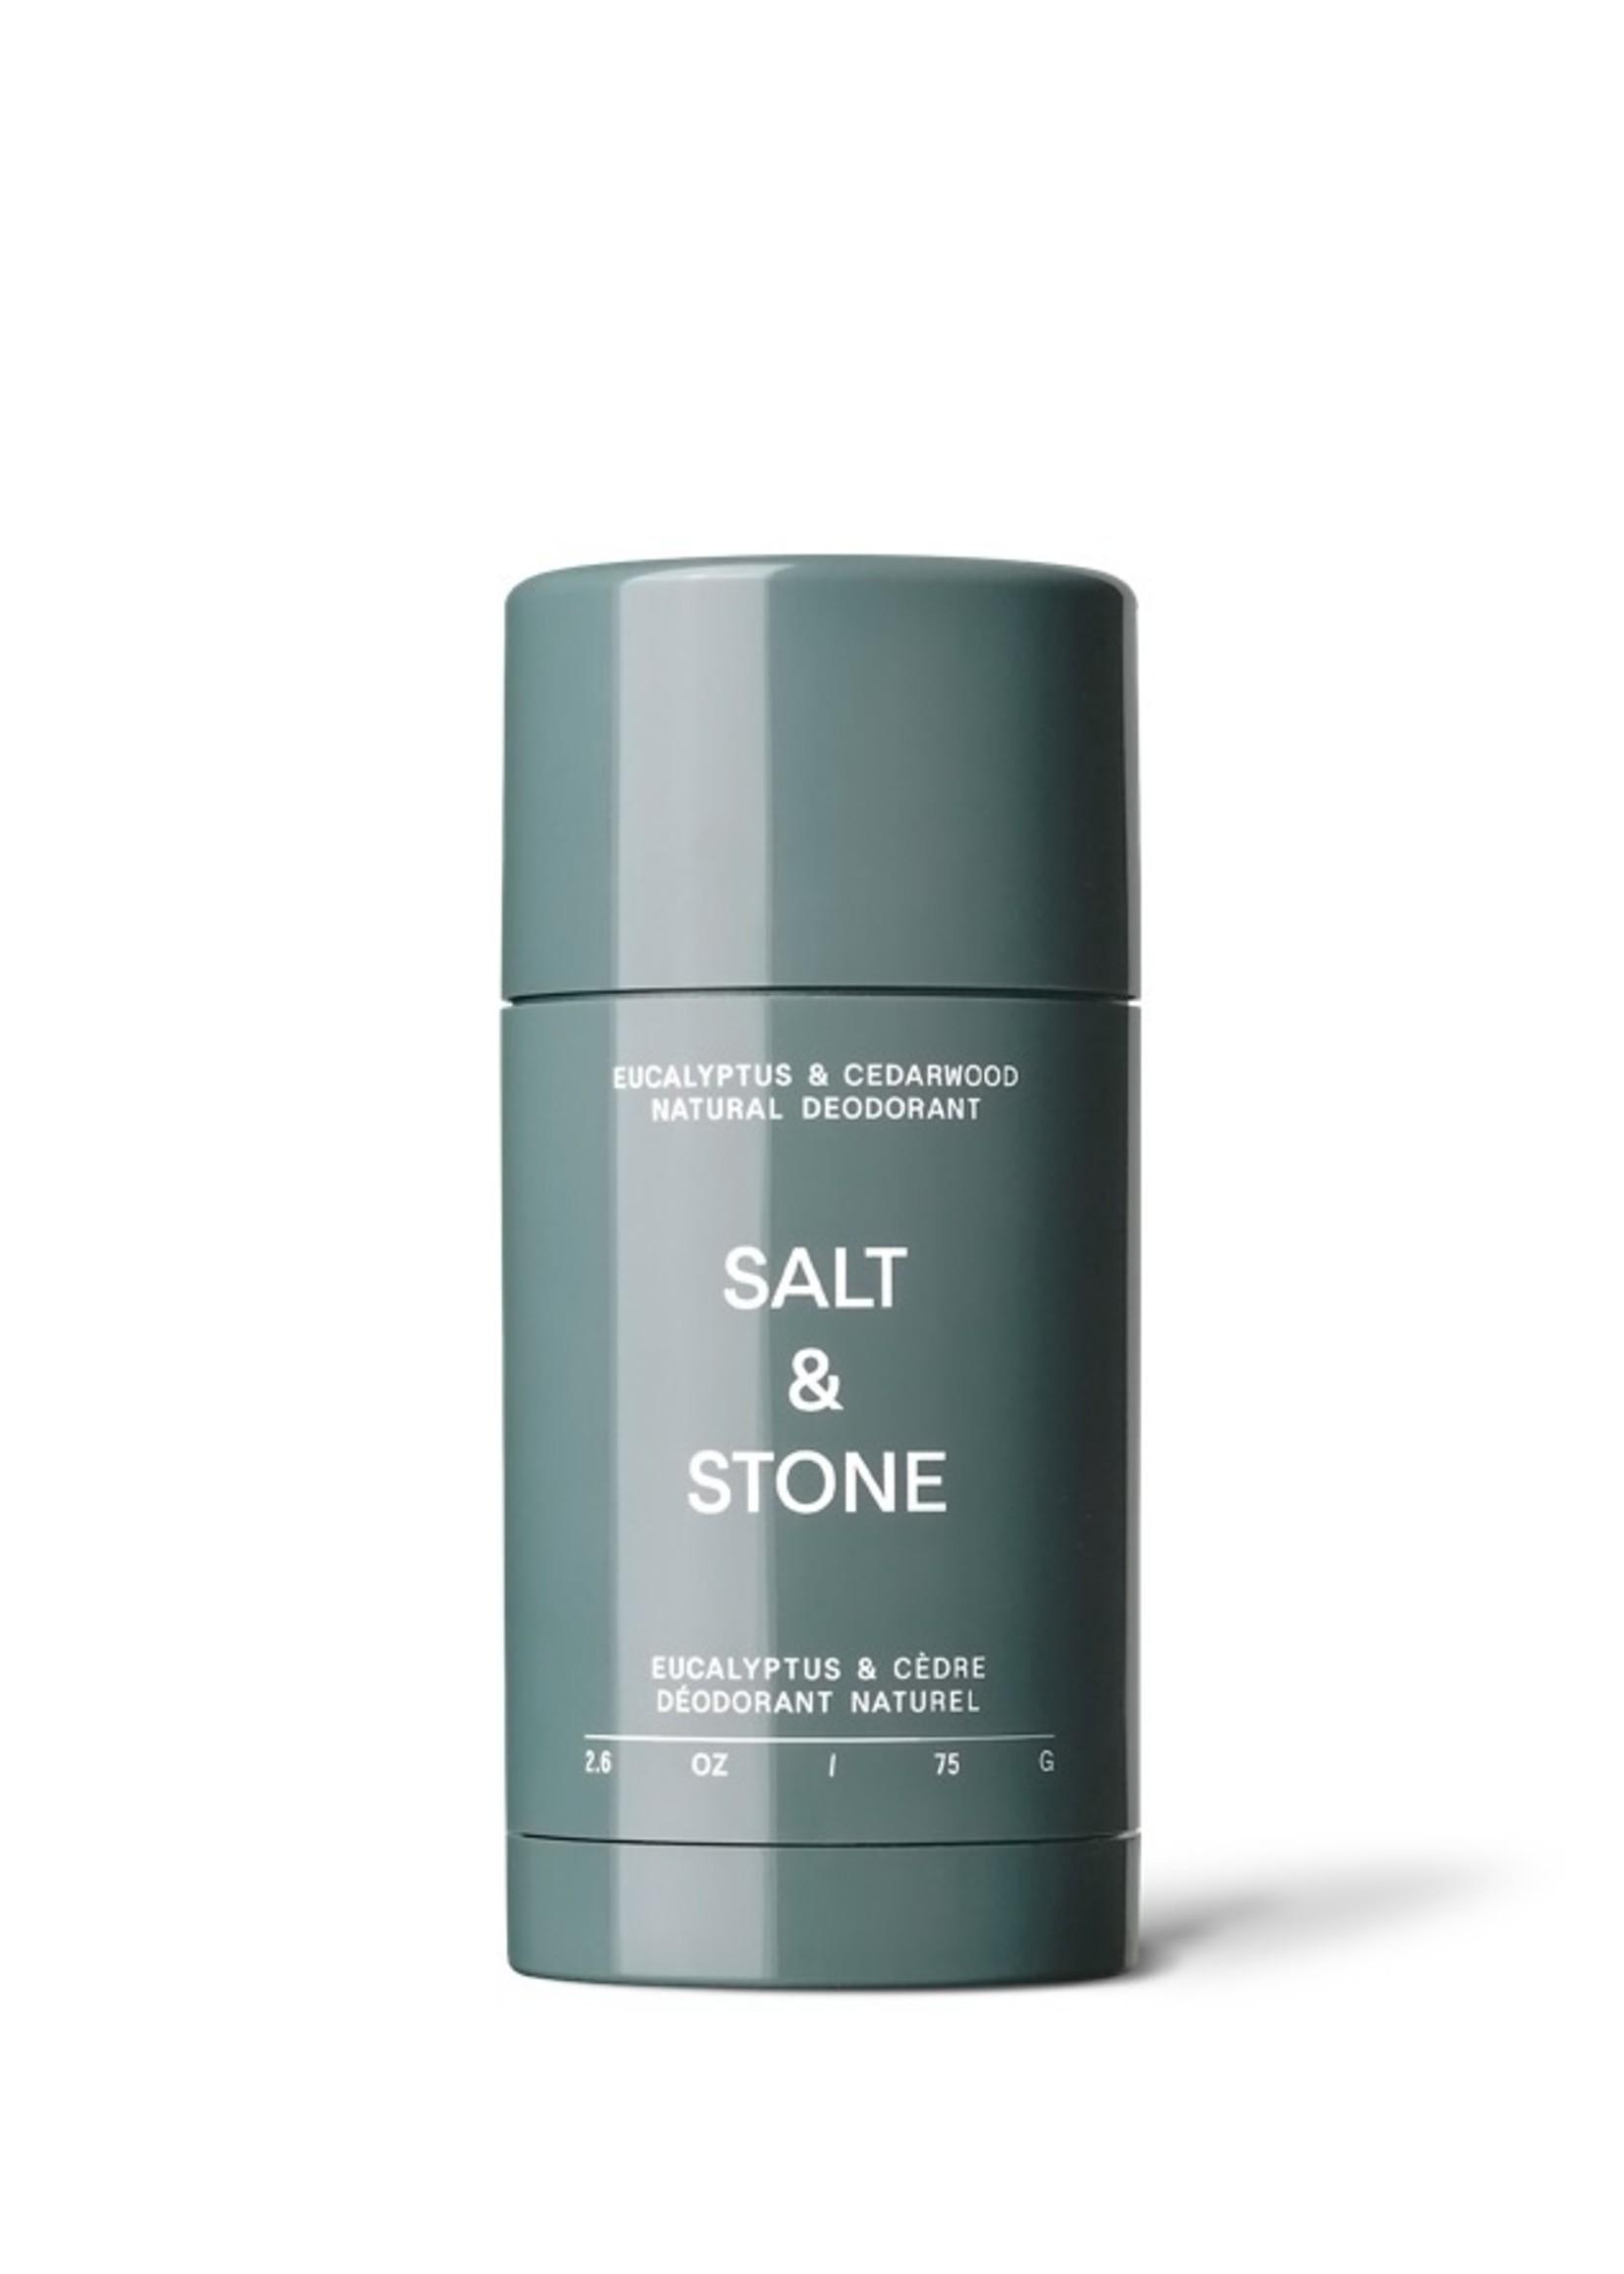 SALT & STONE Eucalyptus & Cedarwood Natural Deodorant